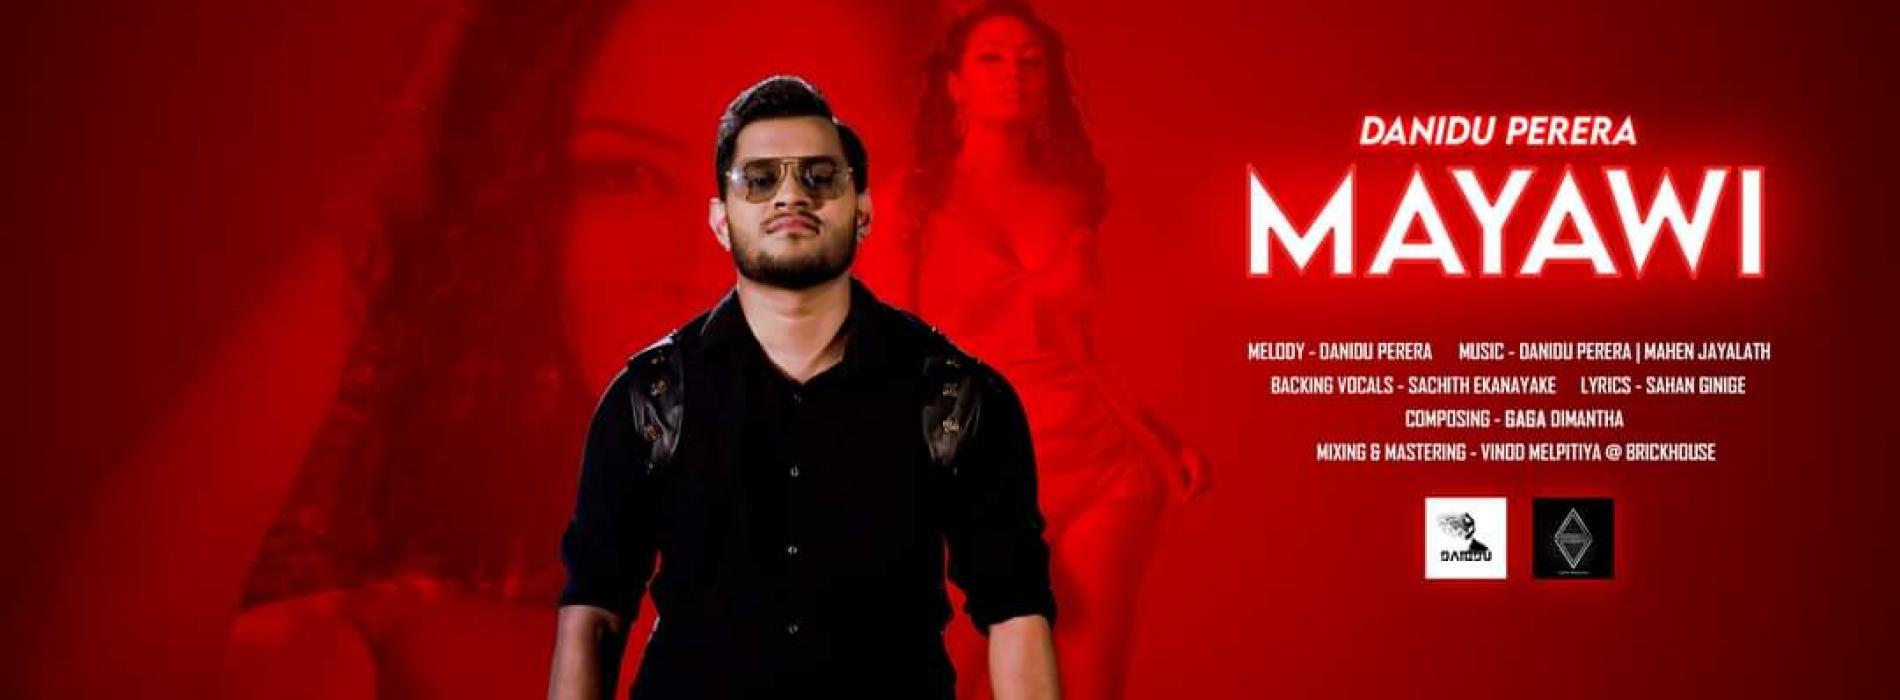 New Music : Danidu Perera – Mayawi (මායාවී) Official Music Video